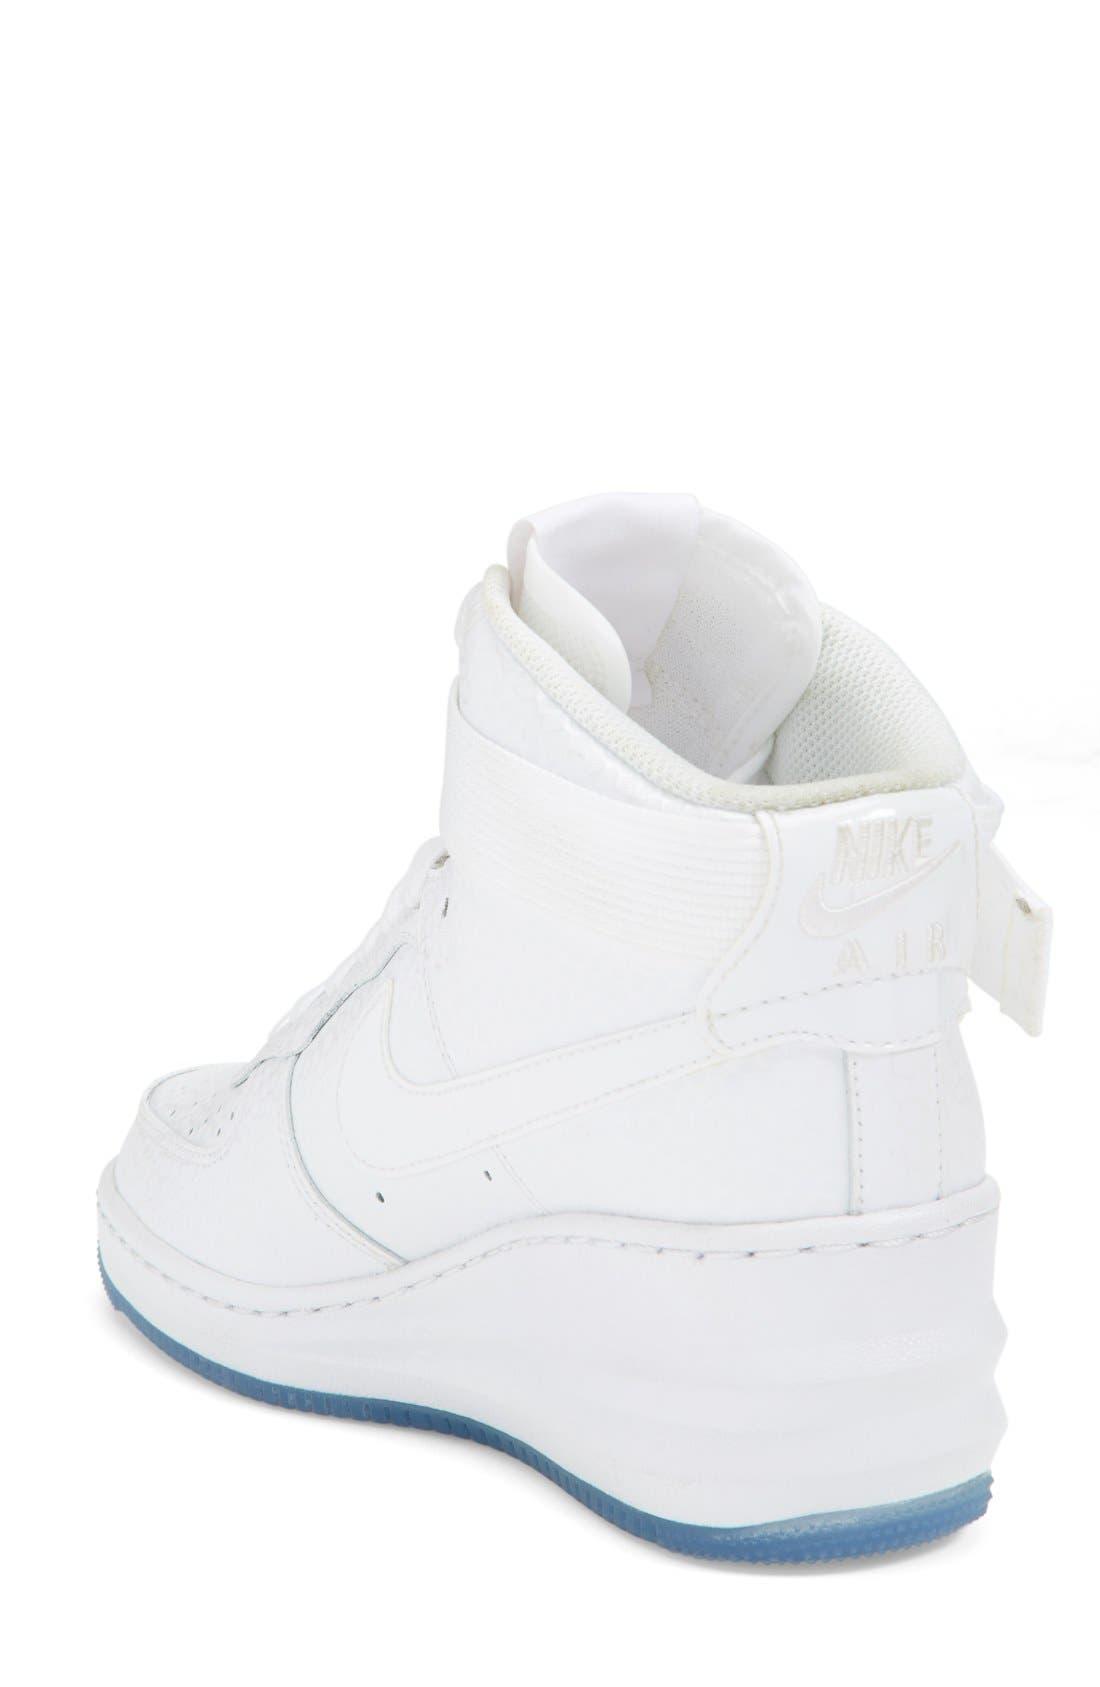 Alternate Image 2  - Nike 'Lunar Force 1 Sky Hi' Sneaker (Women)